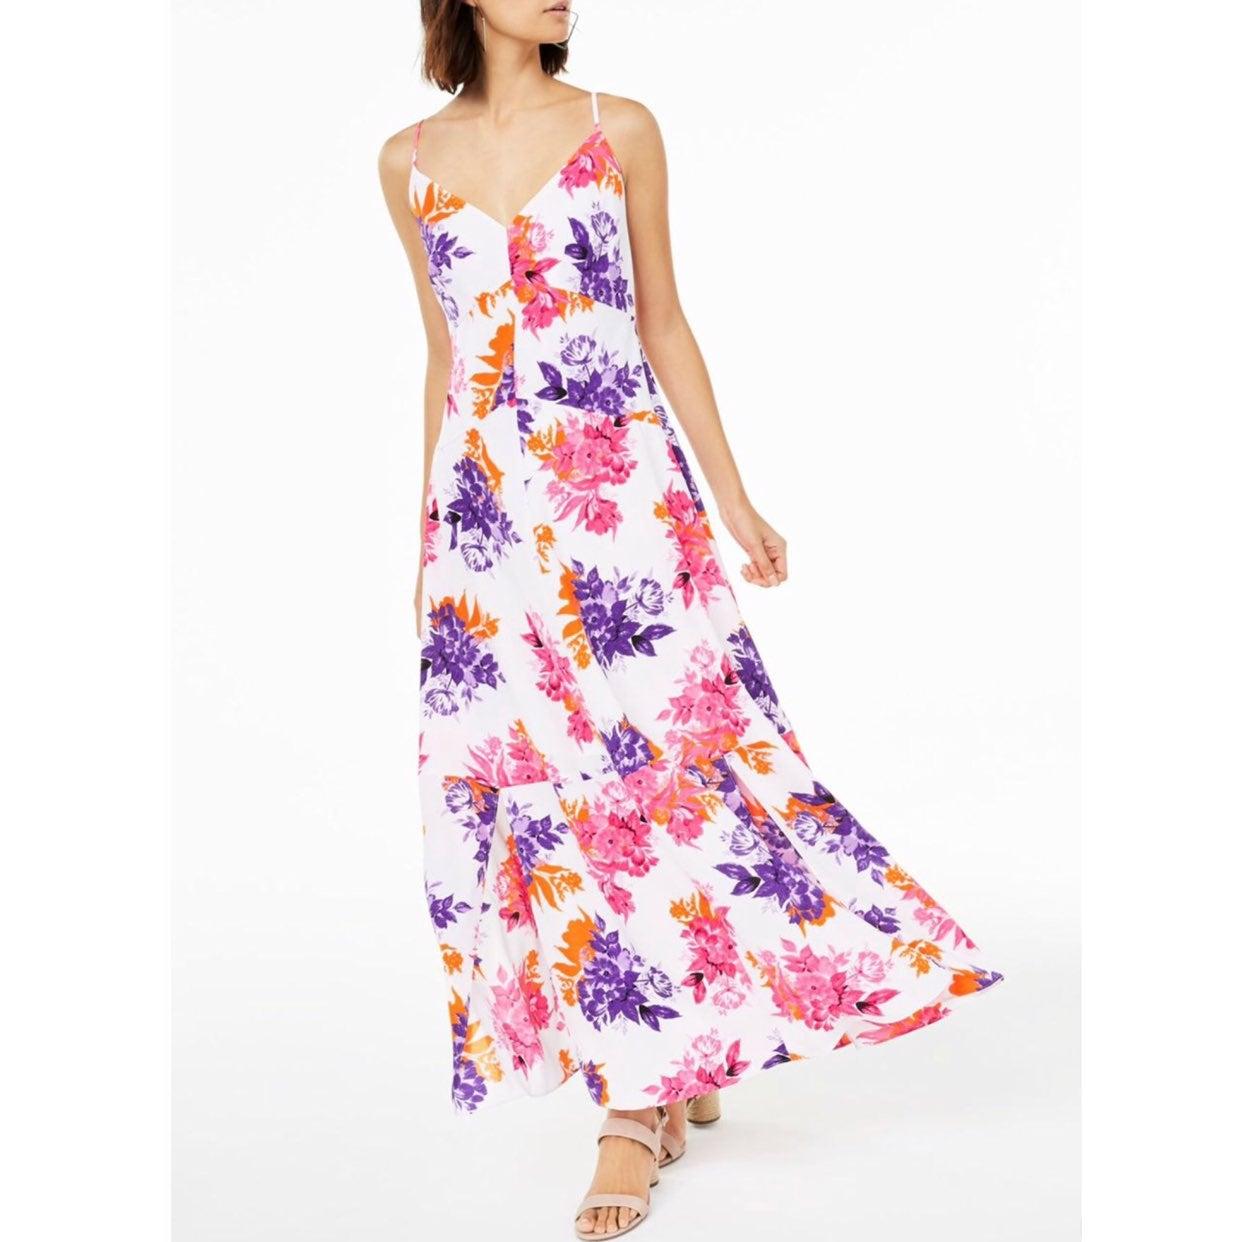 floral spaghetti strap Vneck maxi dress